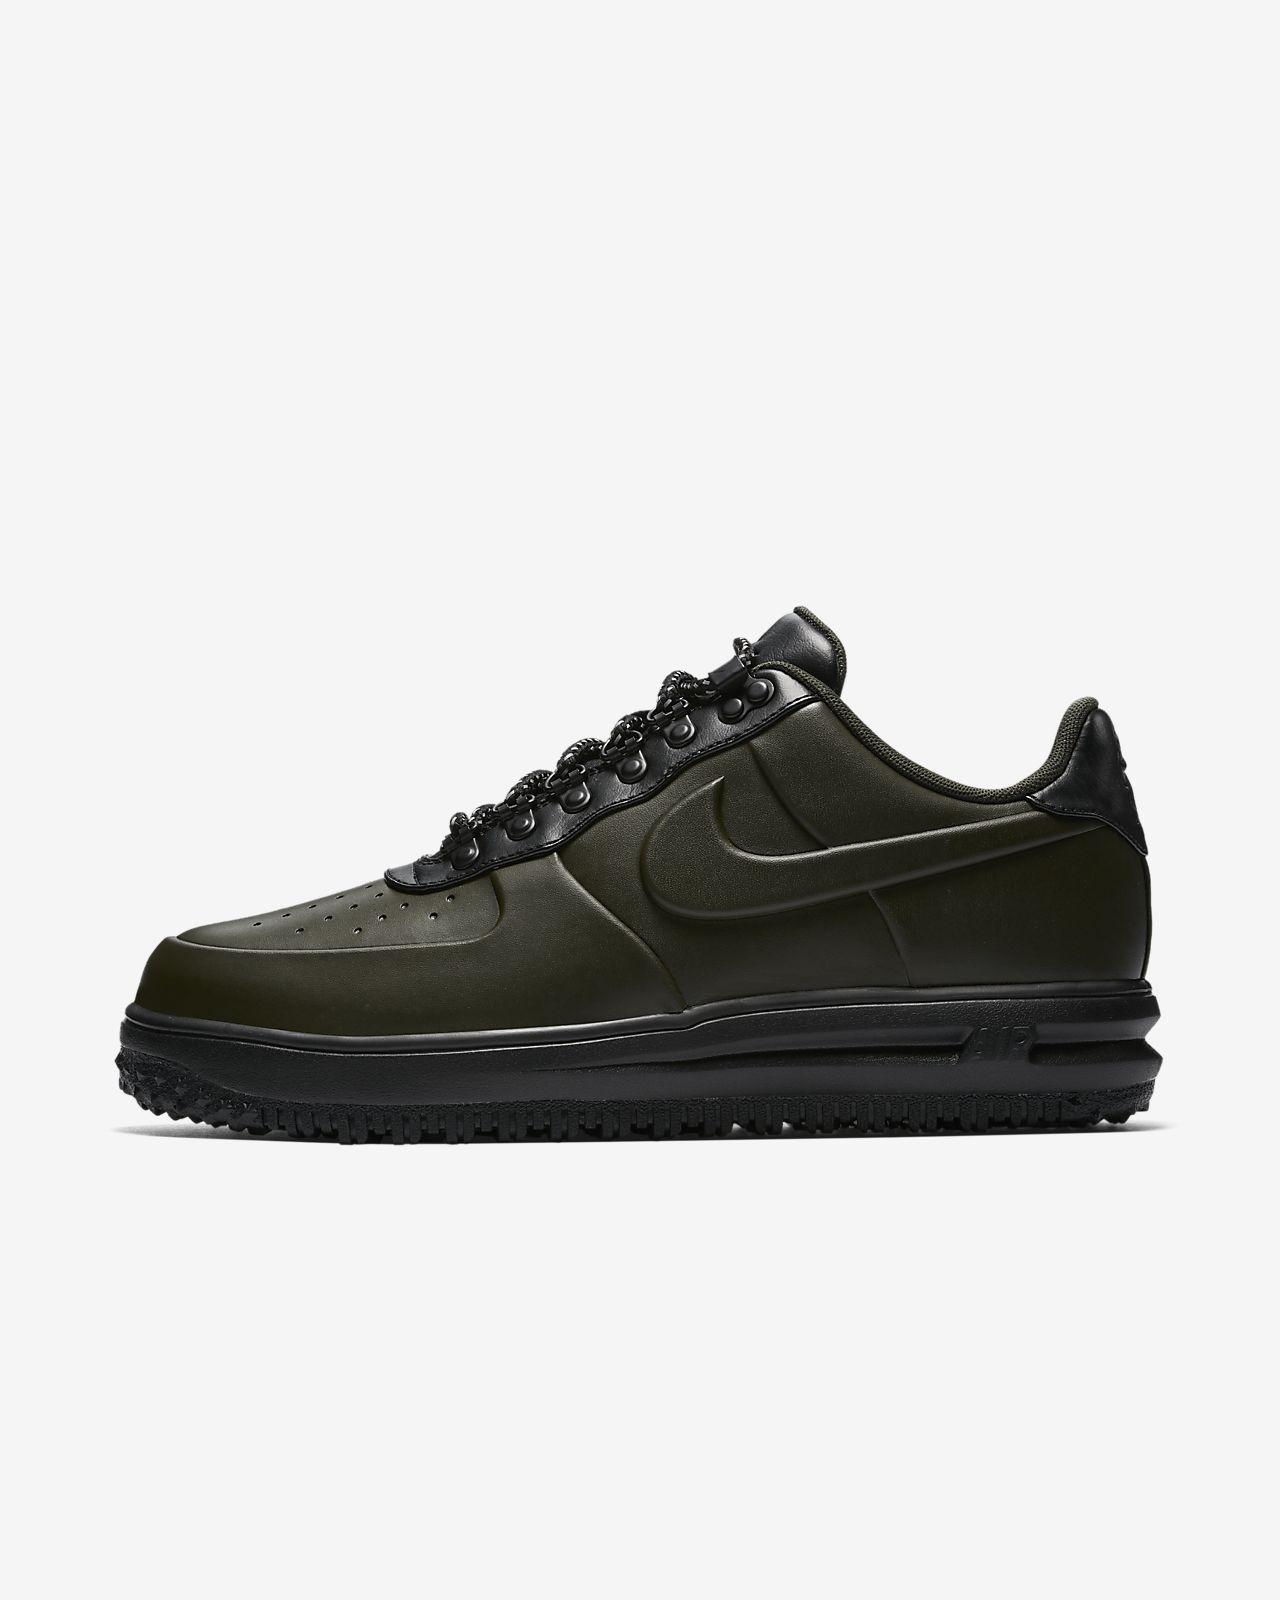 new product d4332 8619d Nike Lunar Force 1 Duckboot Low Men s Shoe